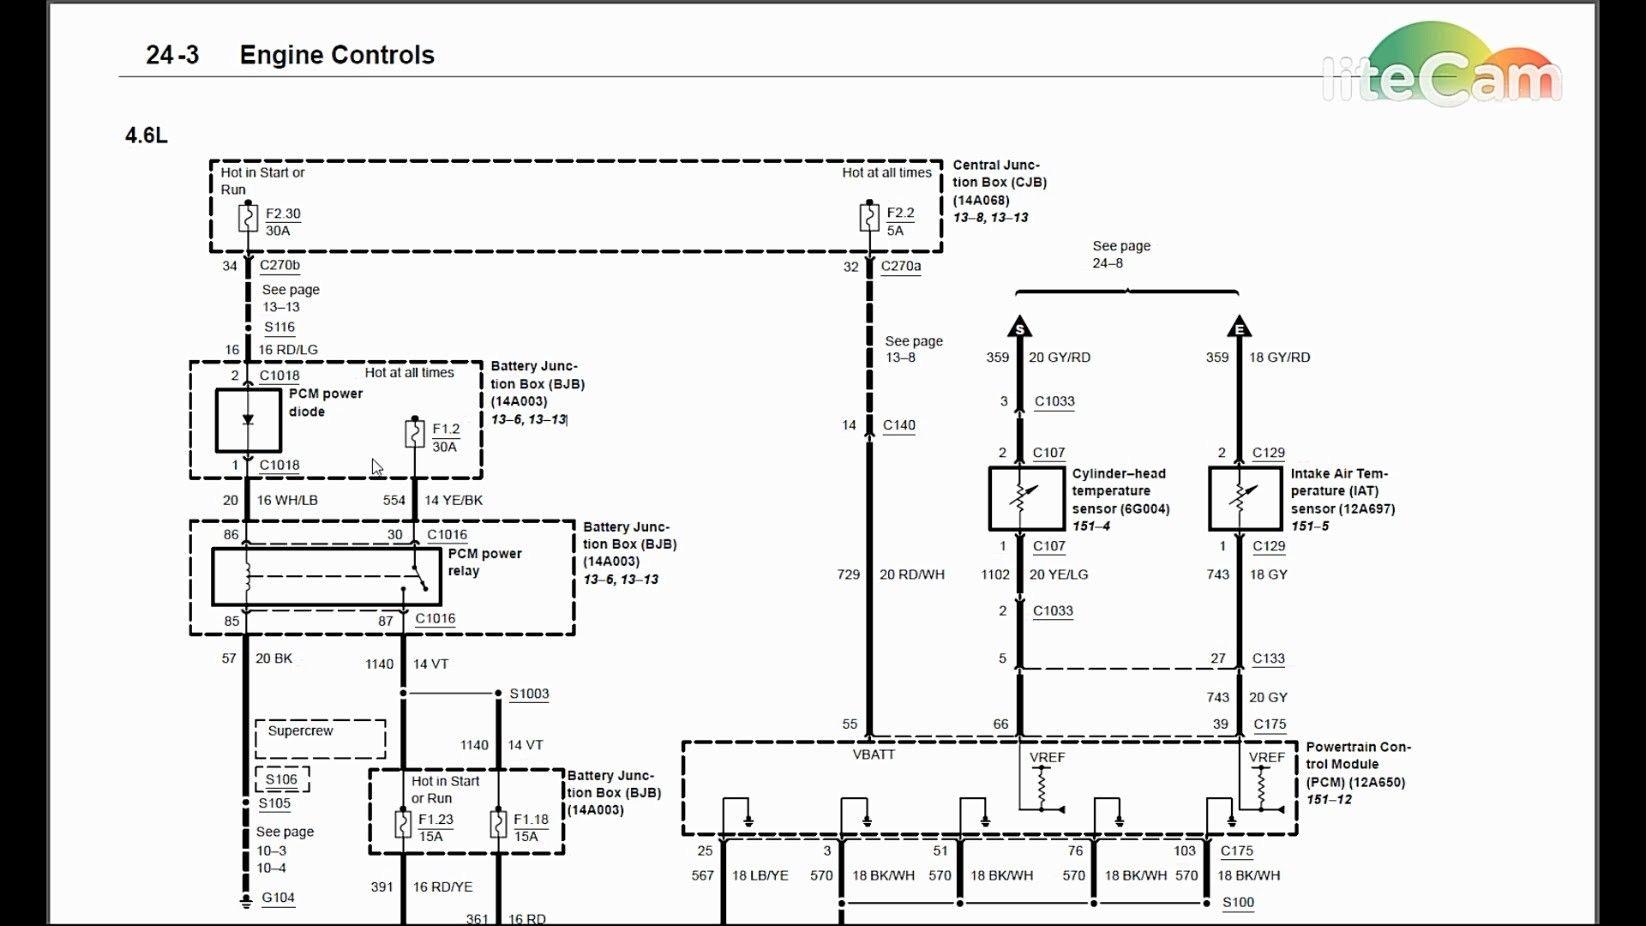 Unique 1997 ford F150 4.6 Spark Plug Wiring Diagram in